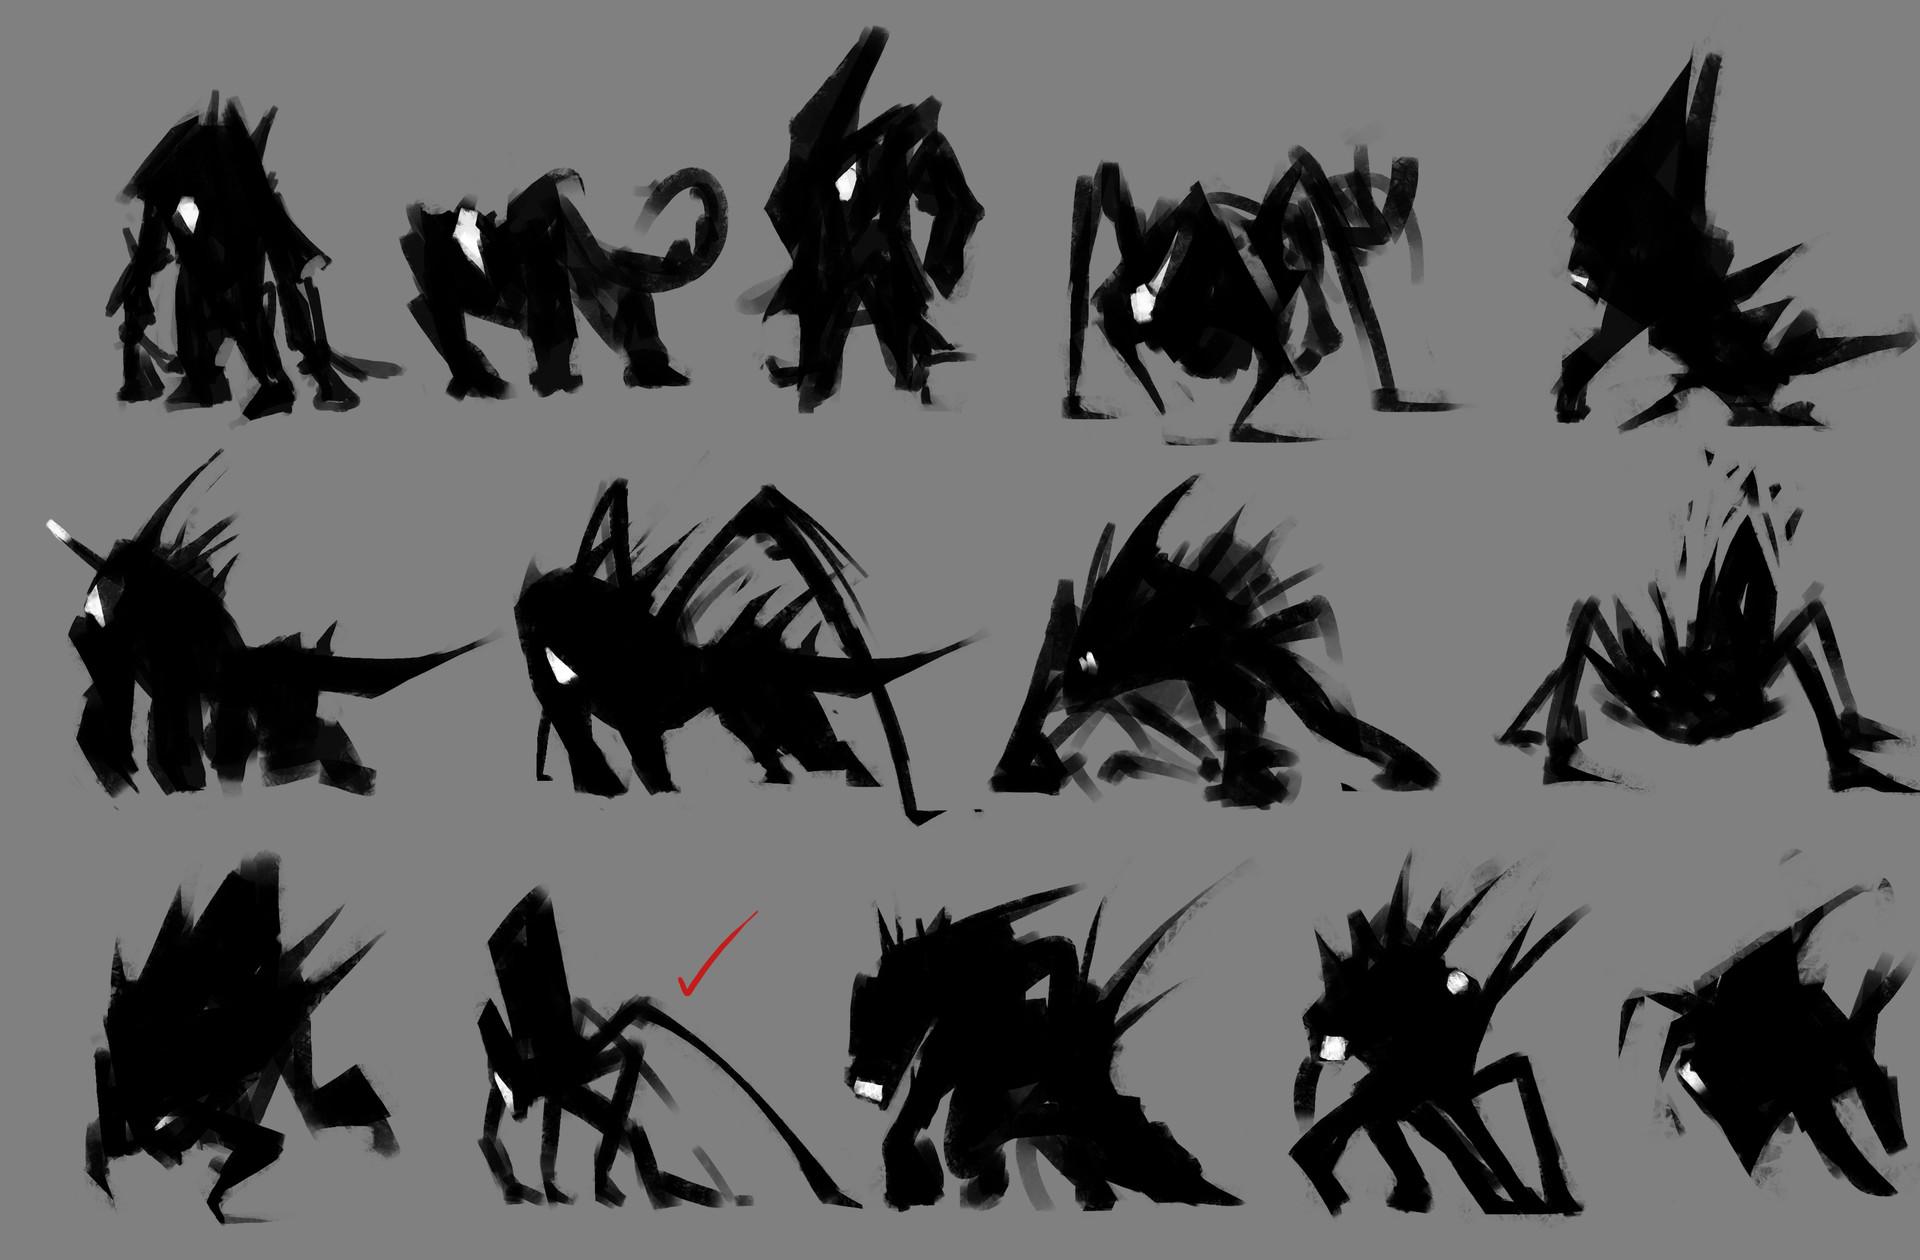 Nicolas morales 23 cdc challenge silhouettes